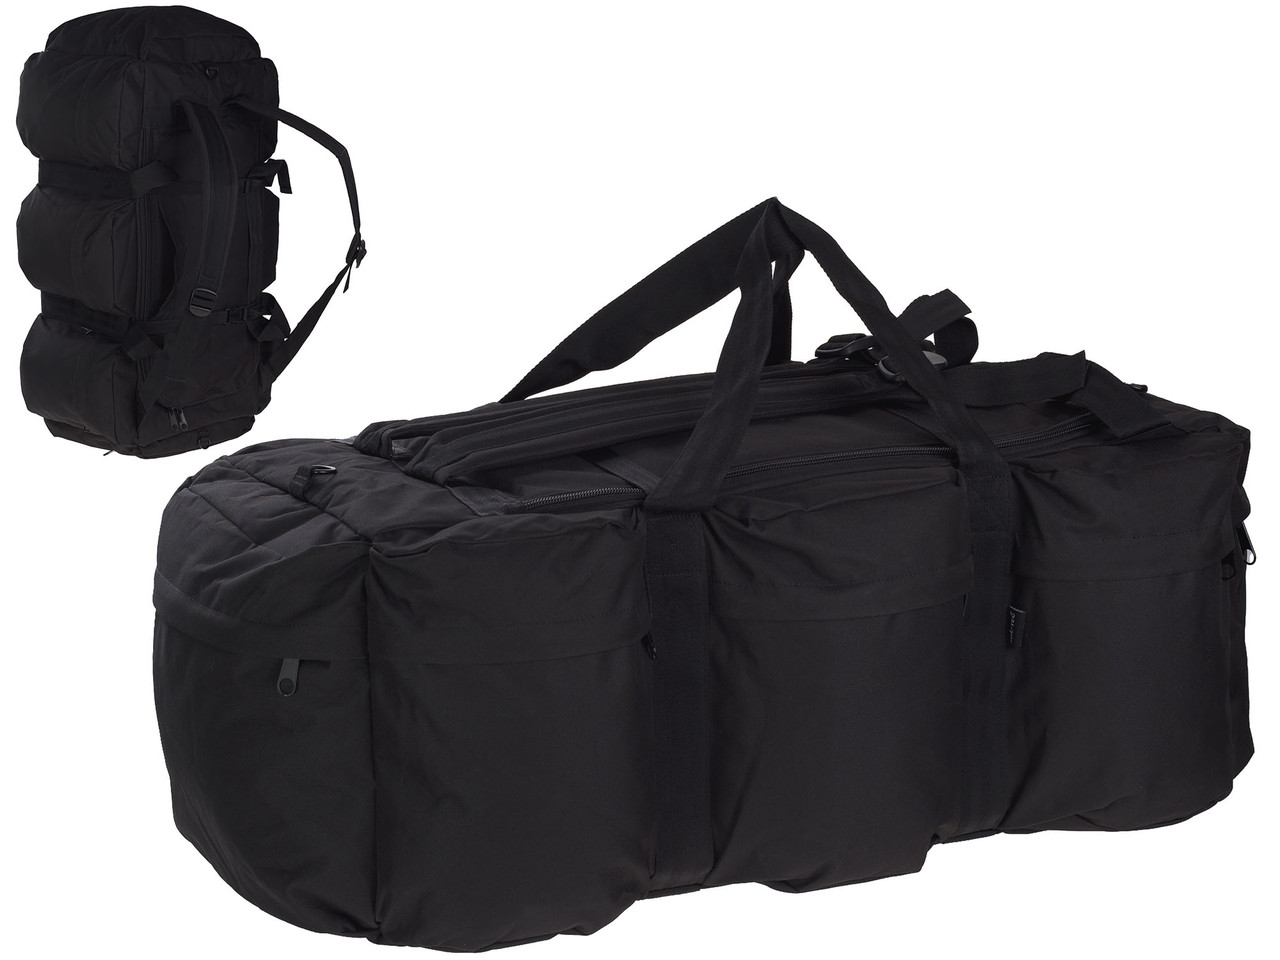 Тактический рюкзак / сумка Mil-TEC COMBAT TAGP 3W1 - 98L